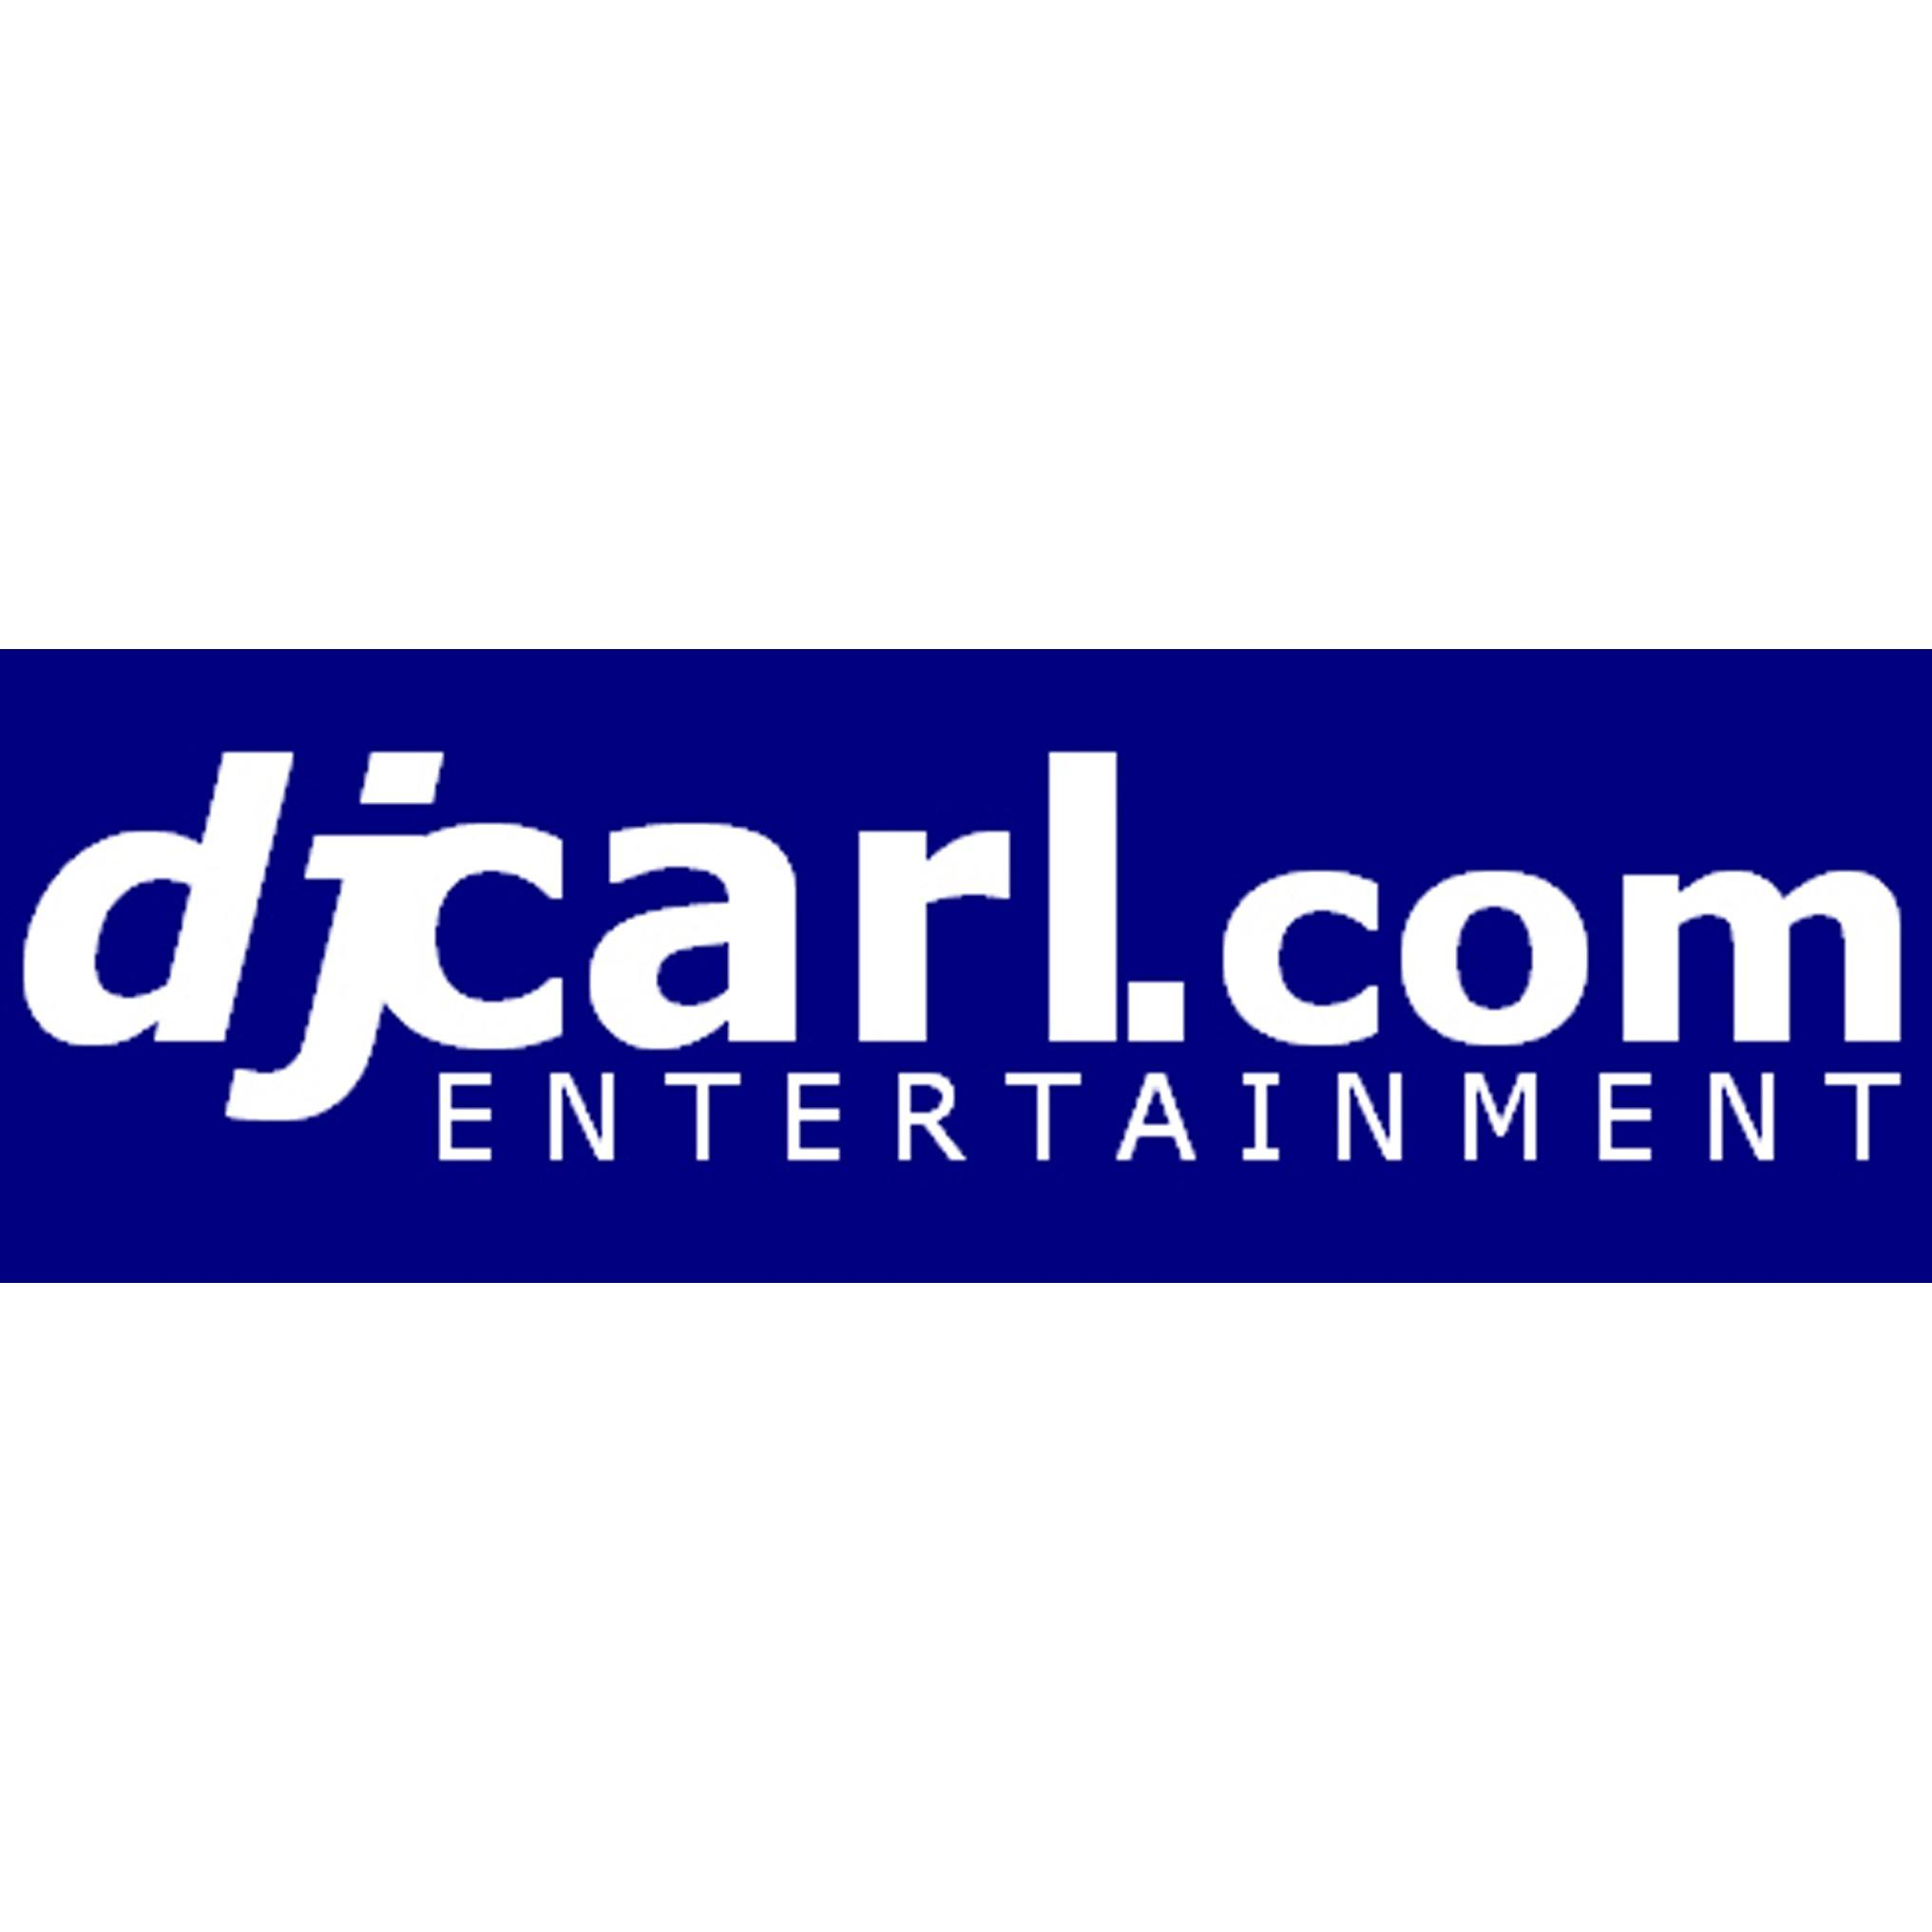 DJCarl.com© Entertainment, LLC